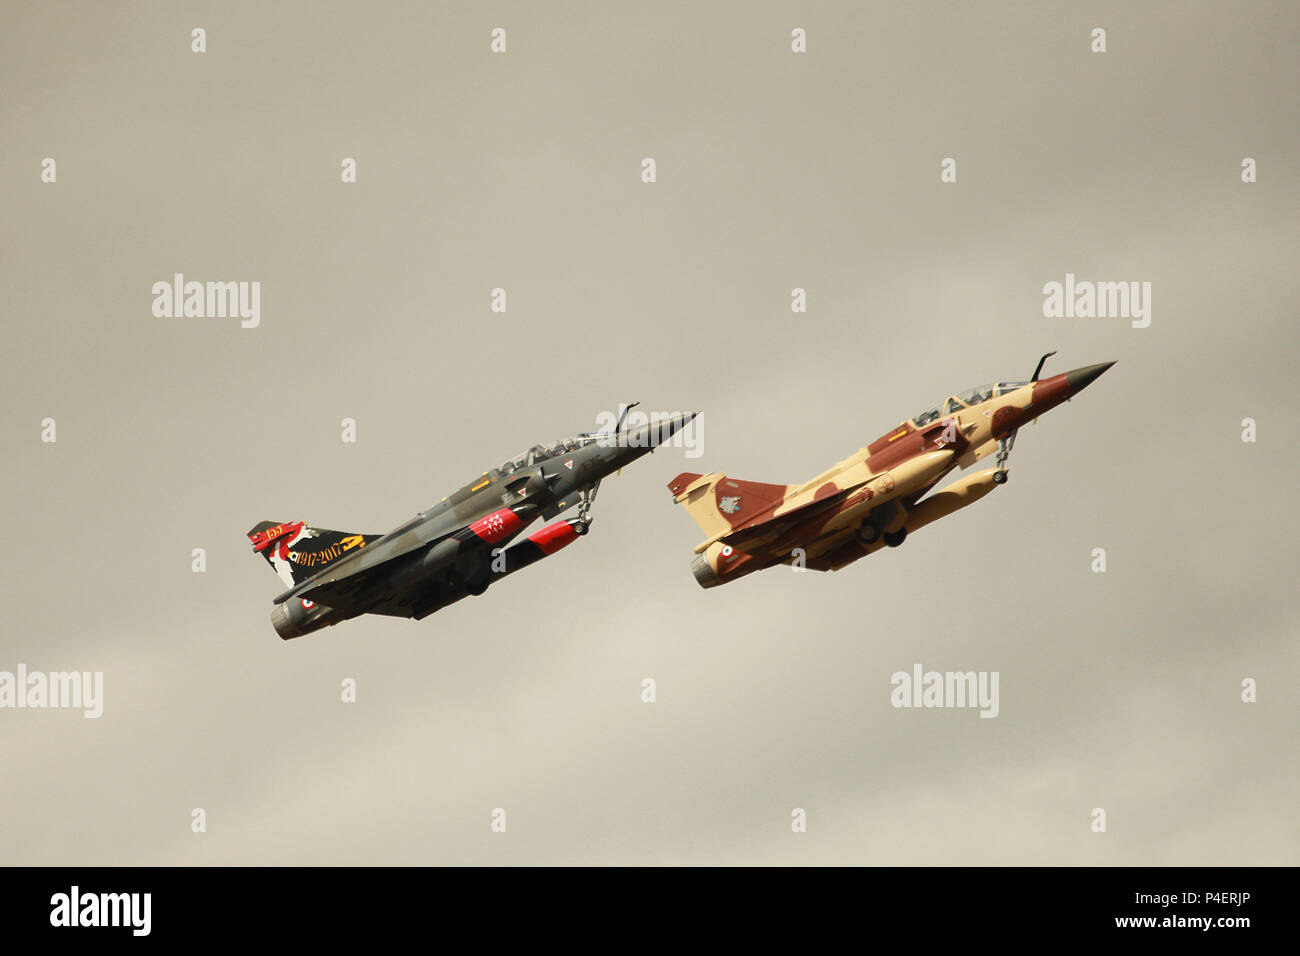 Dassault Mirage 2000 - Stock Image